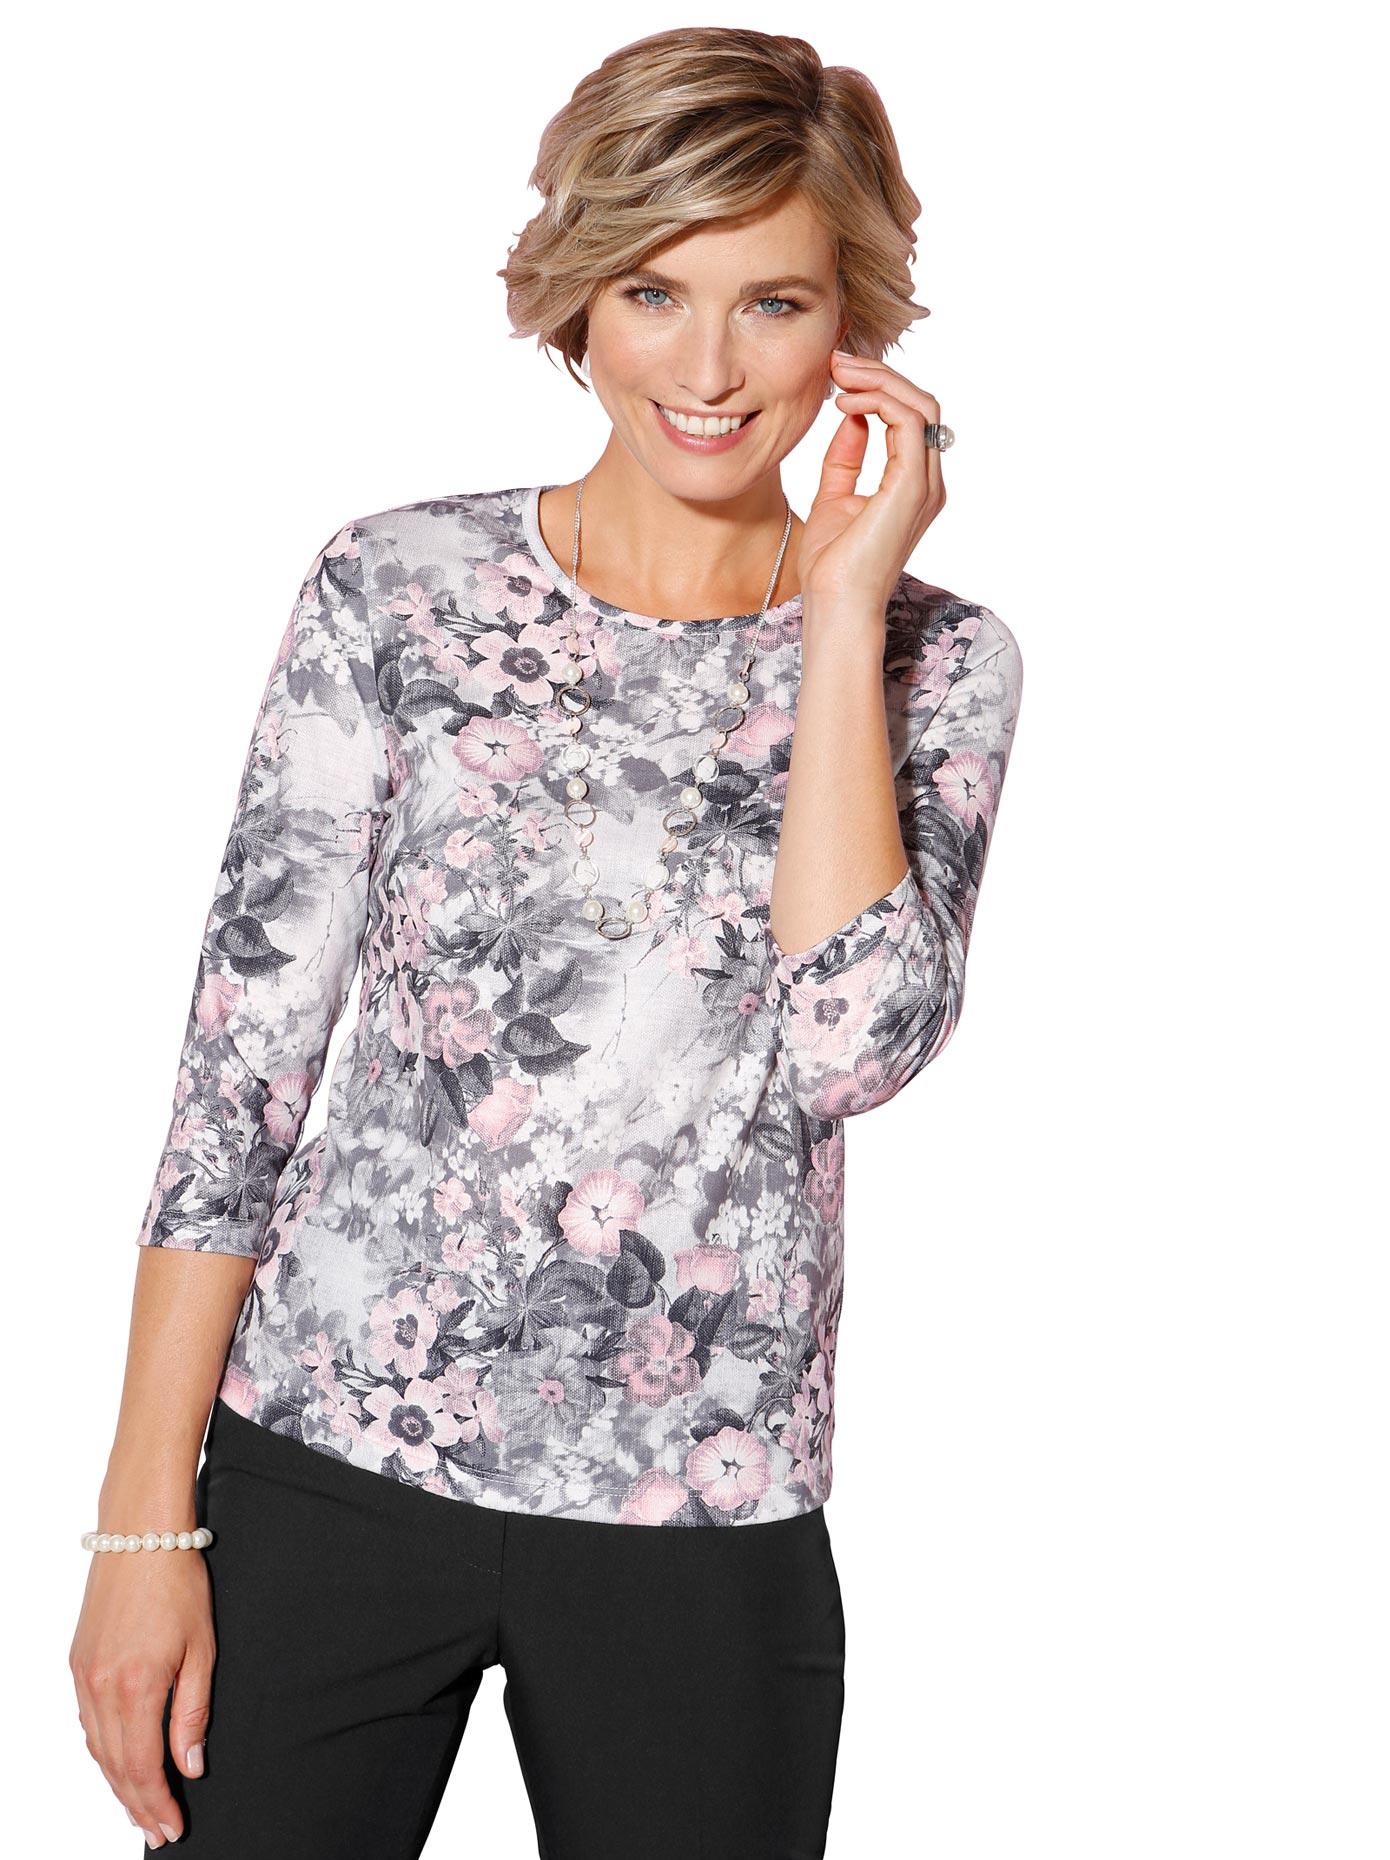 classic -  Shirt mit Floral-Druck